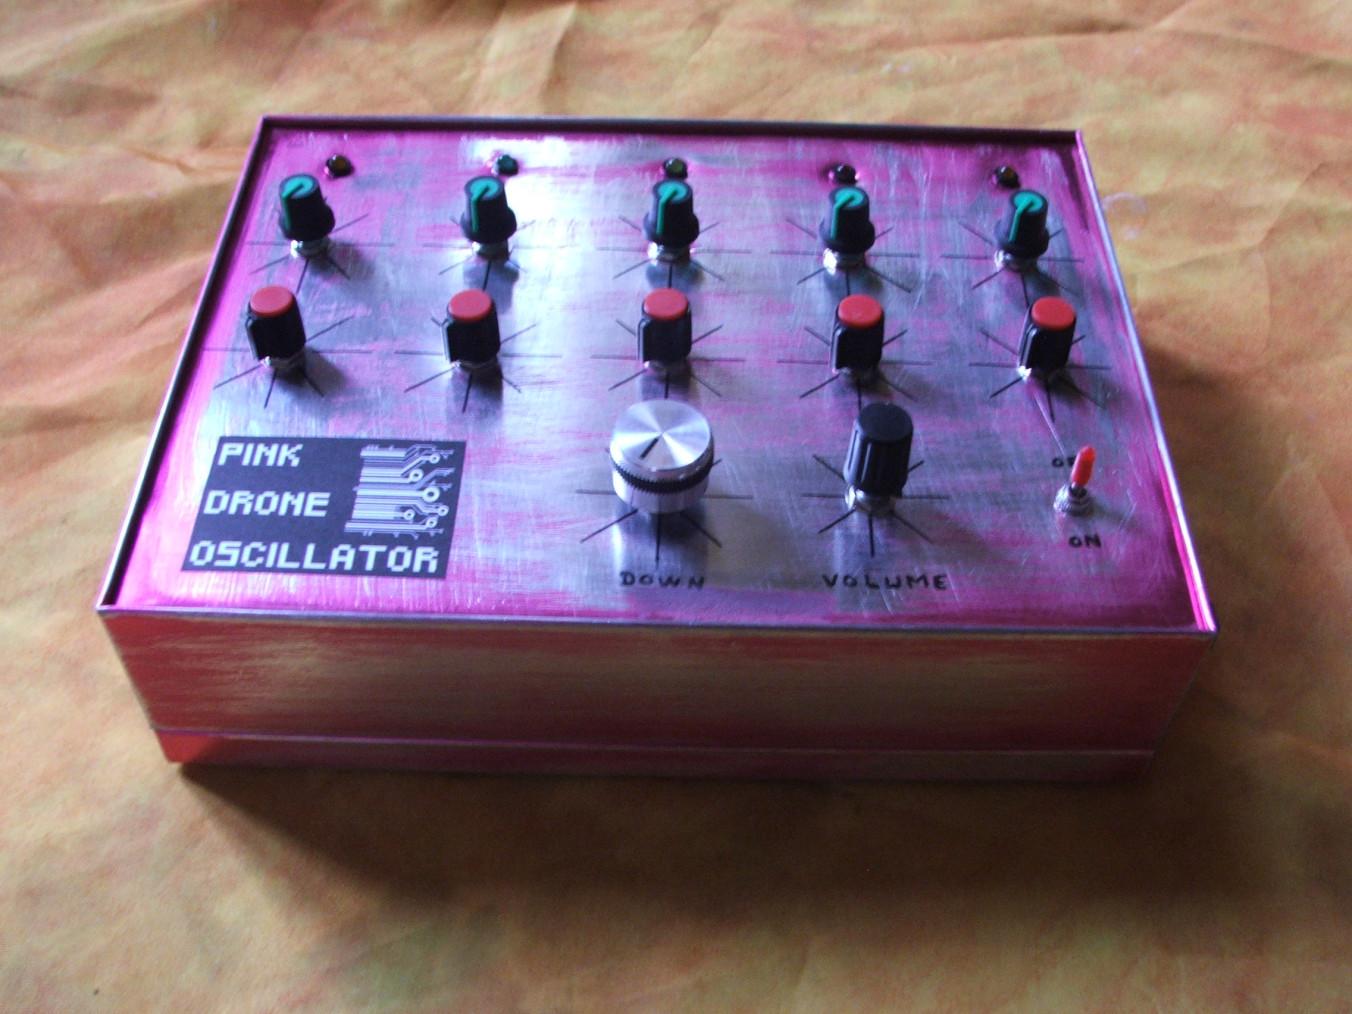 Heres soundbenders take on the circuit!  link